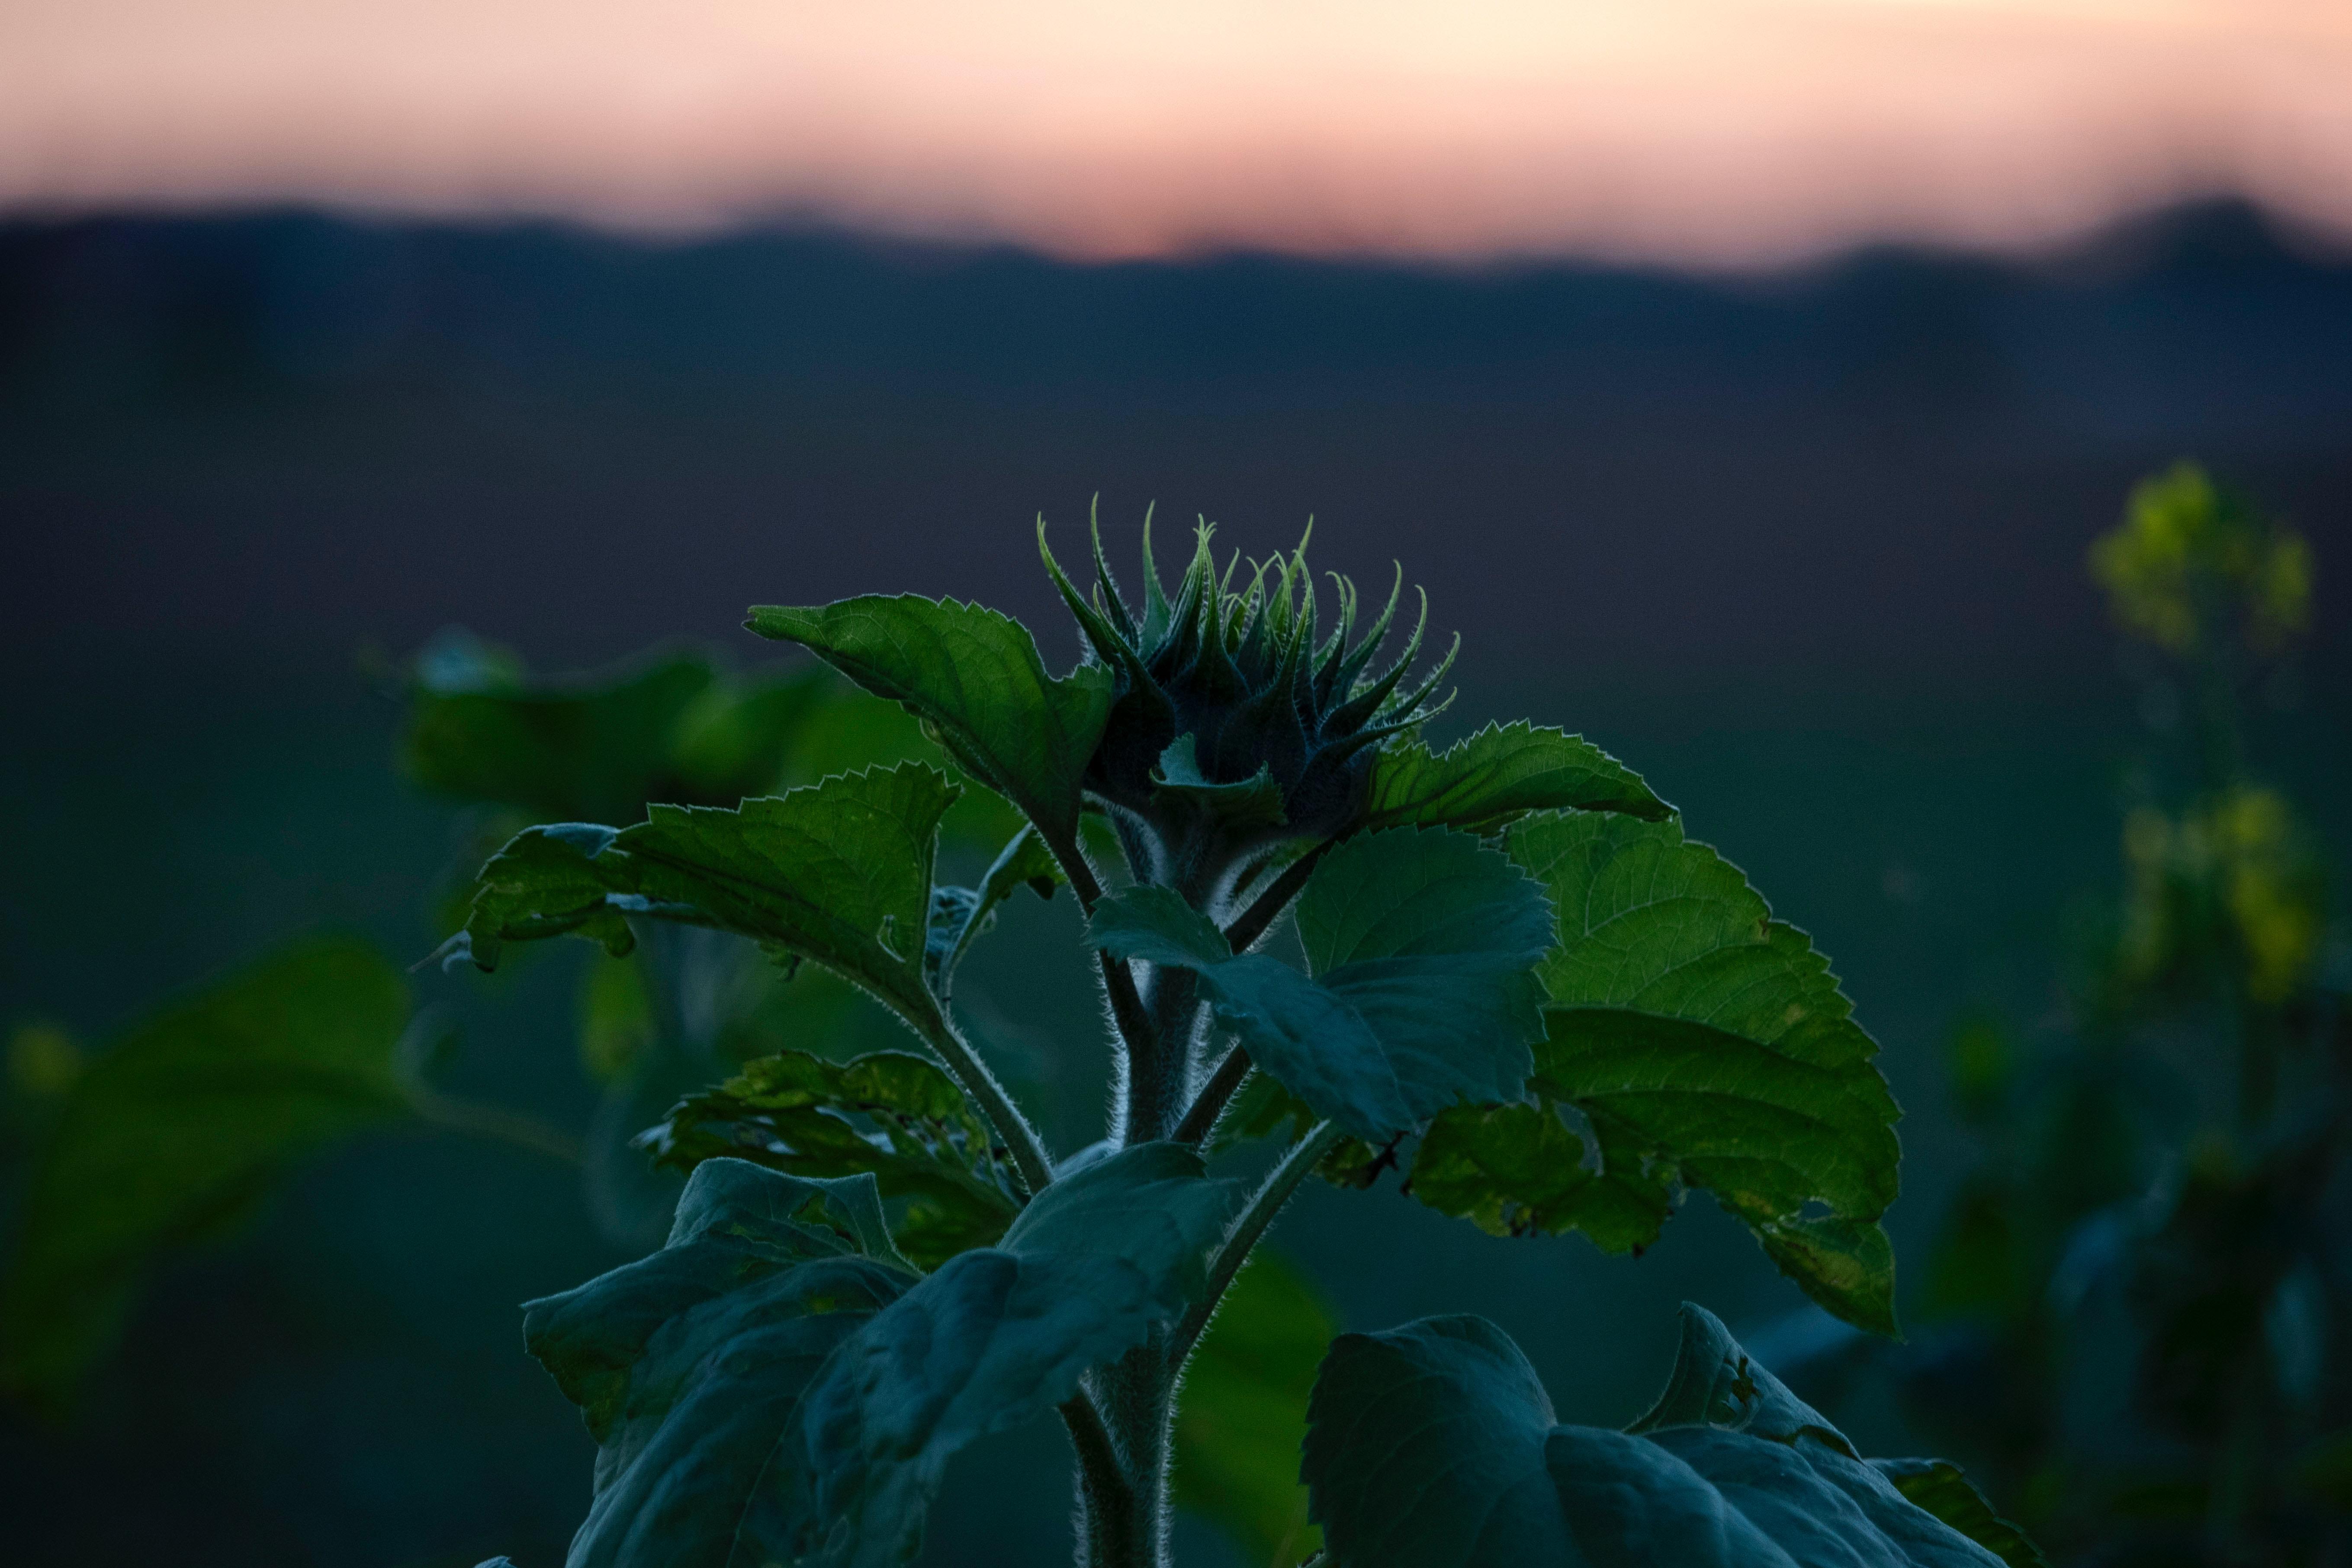 Foto Stok Gratis Tentang Bunga Fokus Selektif Hijau